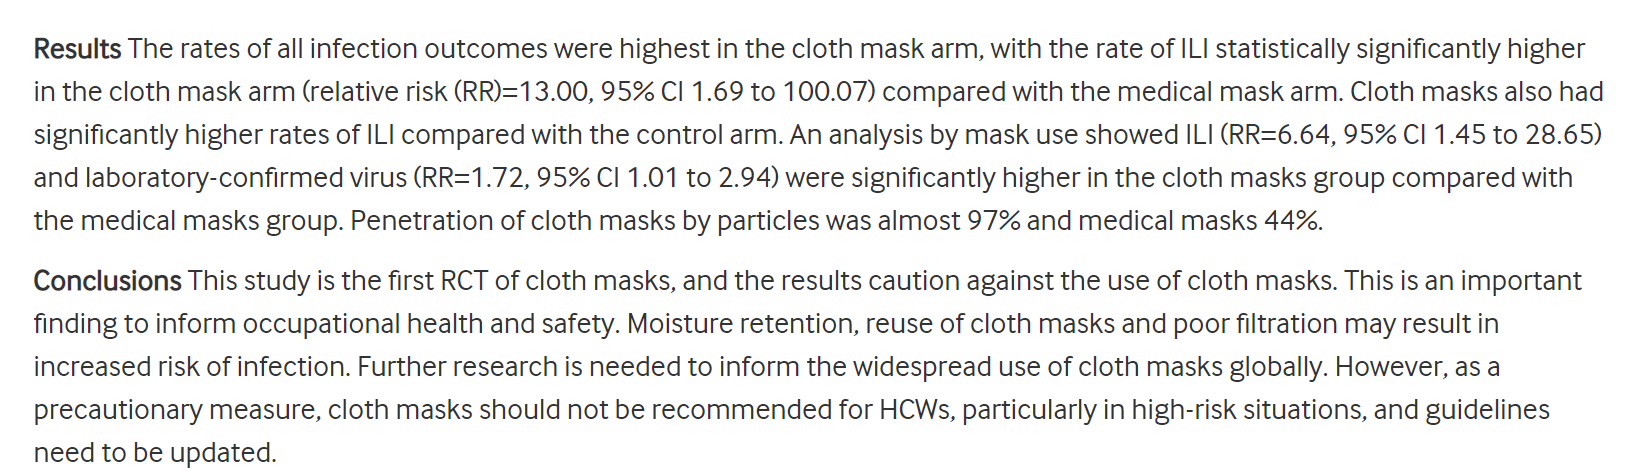 cloth masks hurt